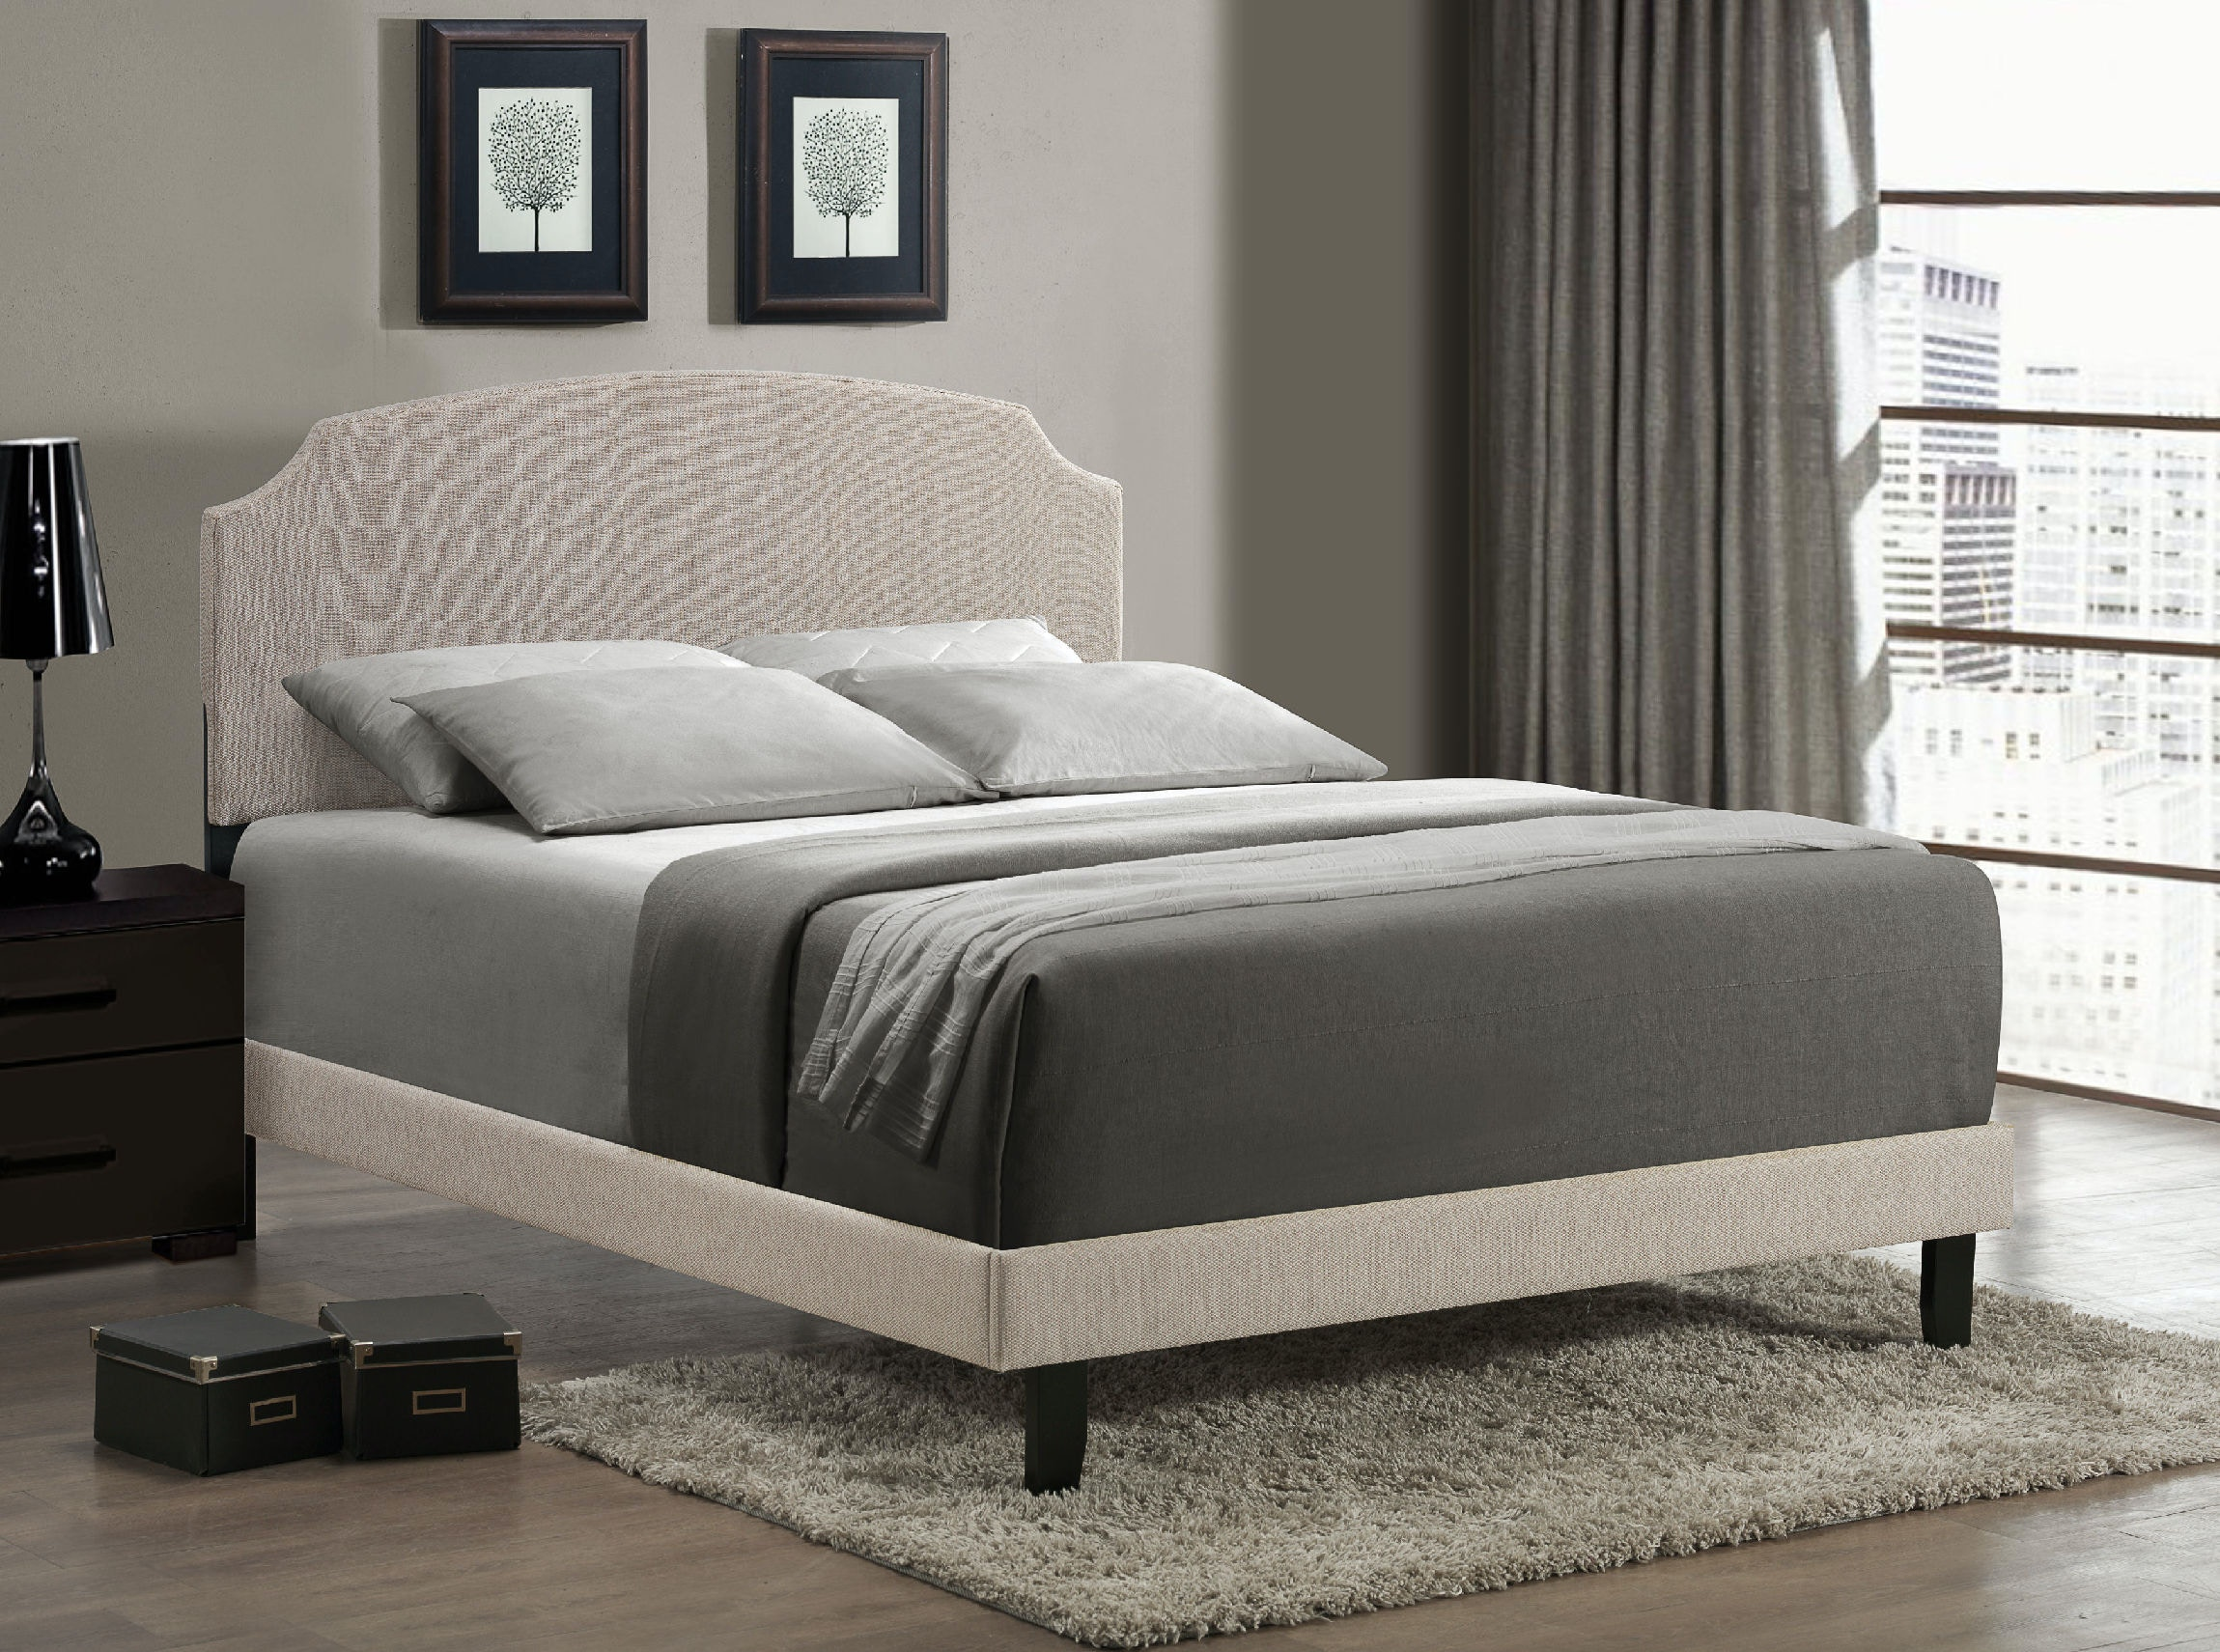 Hillsdale Furniture Bedroom Becker Footboard And Rails   King 1299 650 At Carol  House Furniture